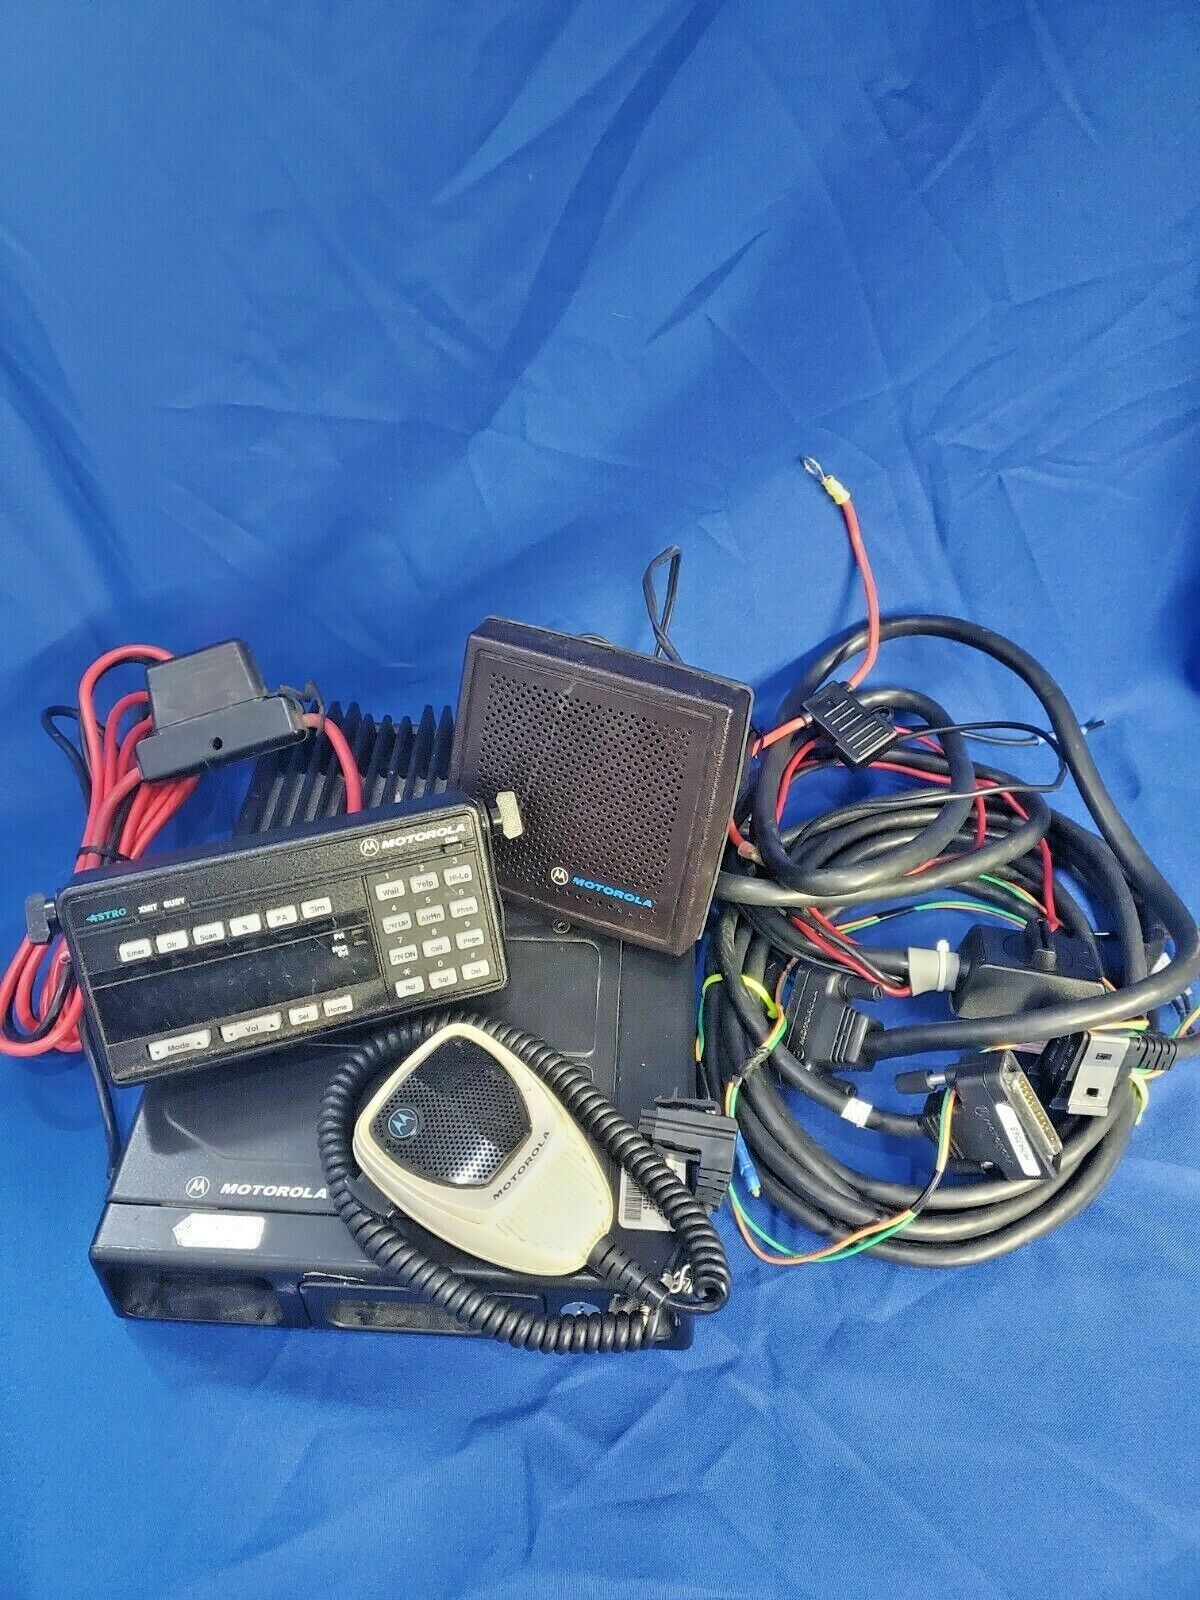 Motorola Astro Spectra Mobile Radio. Available Now for 289.00